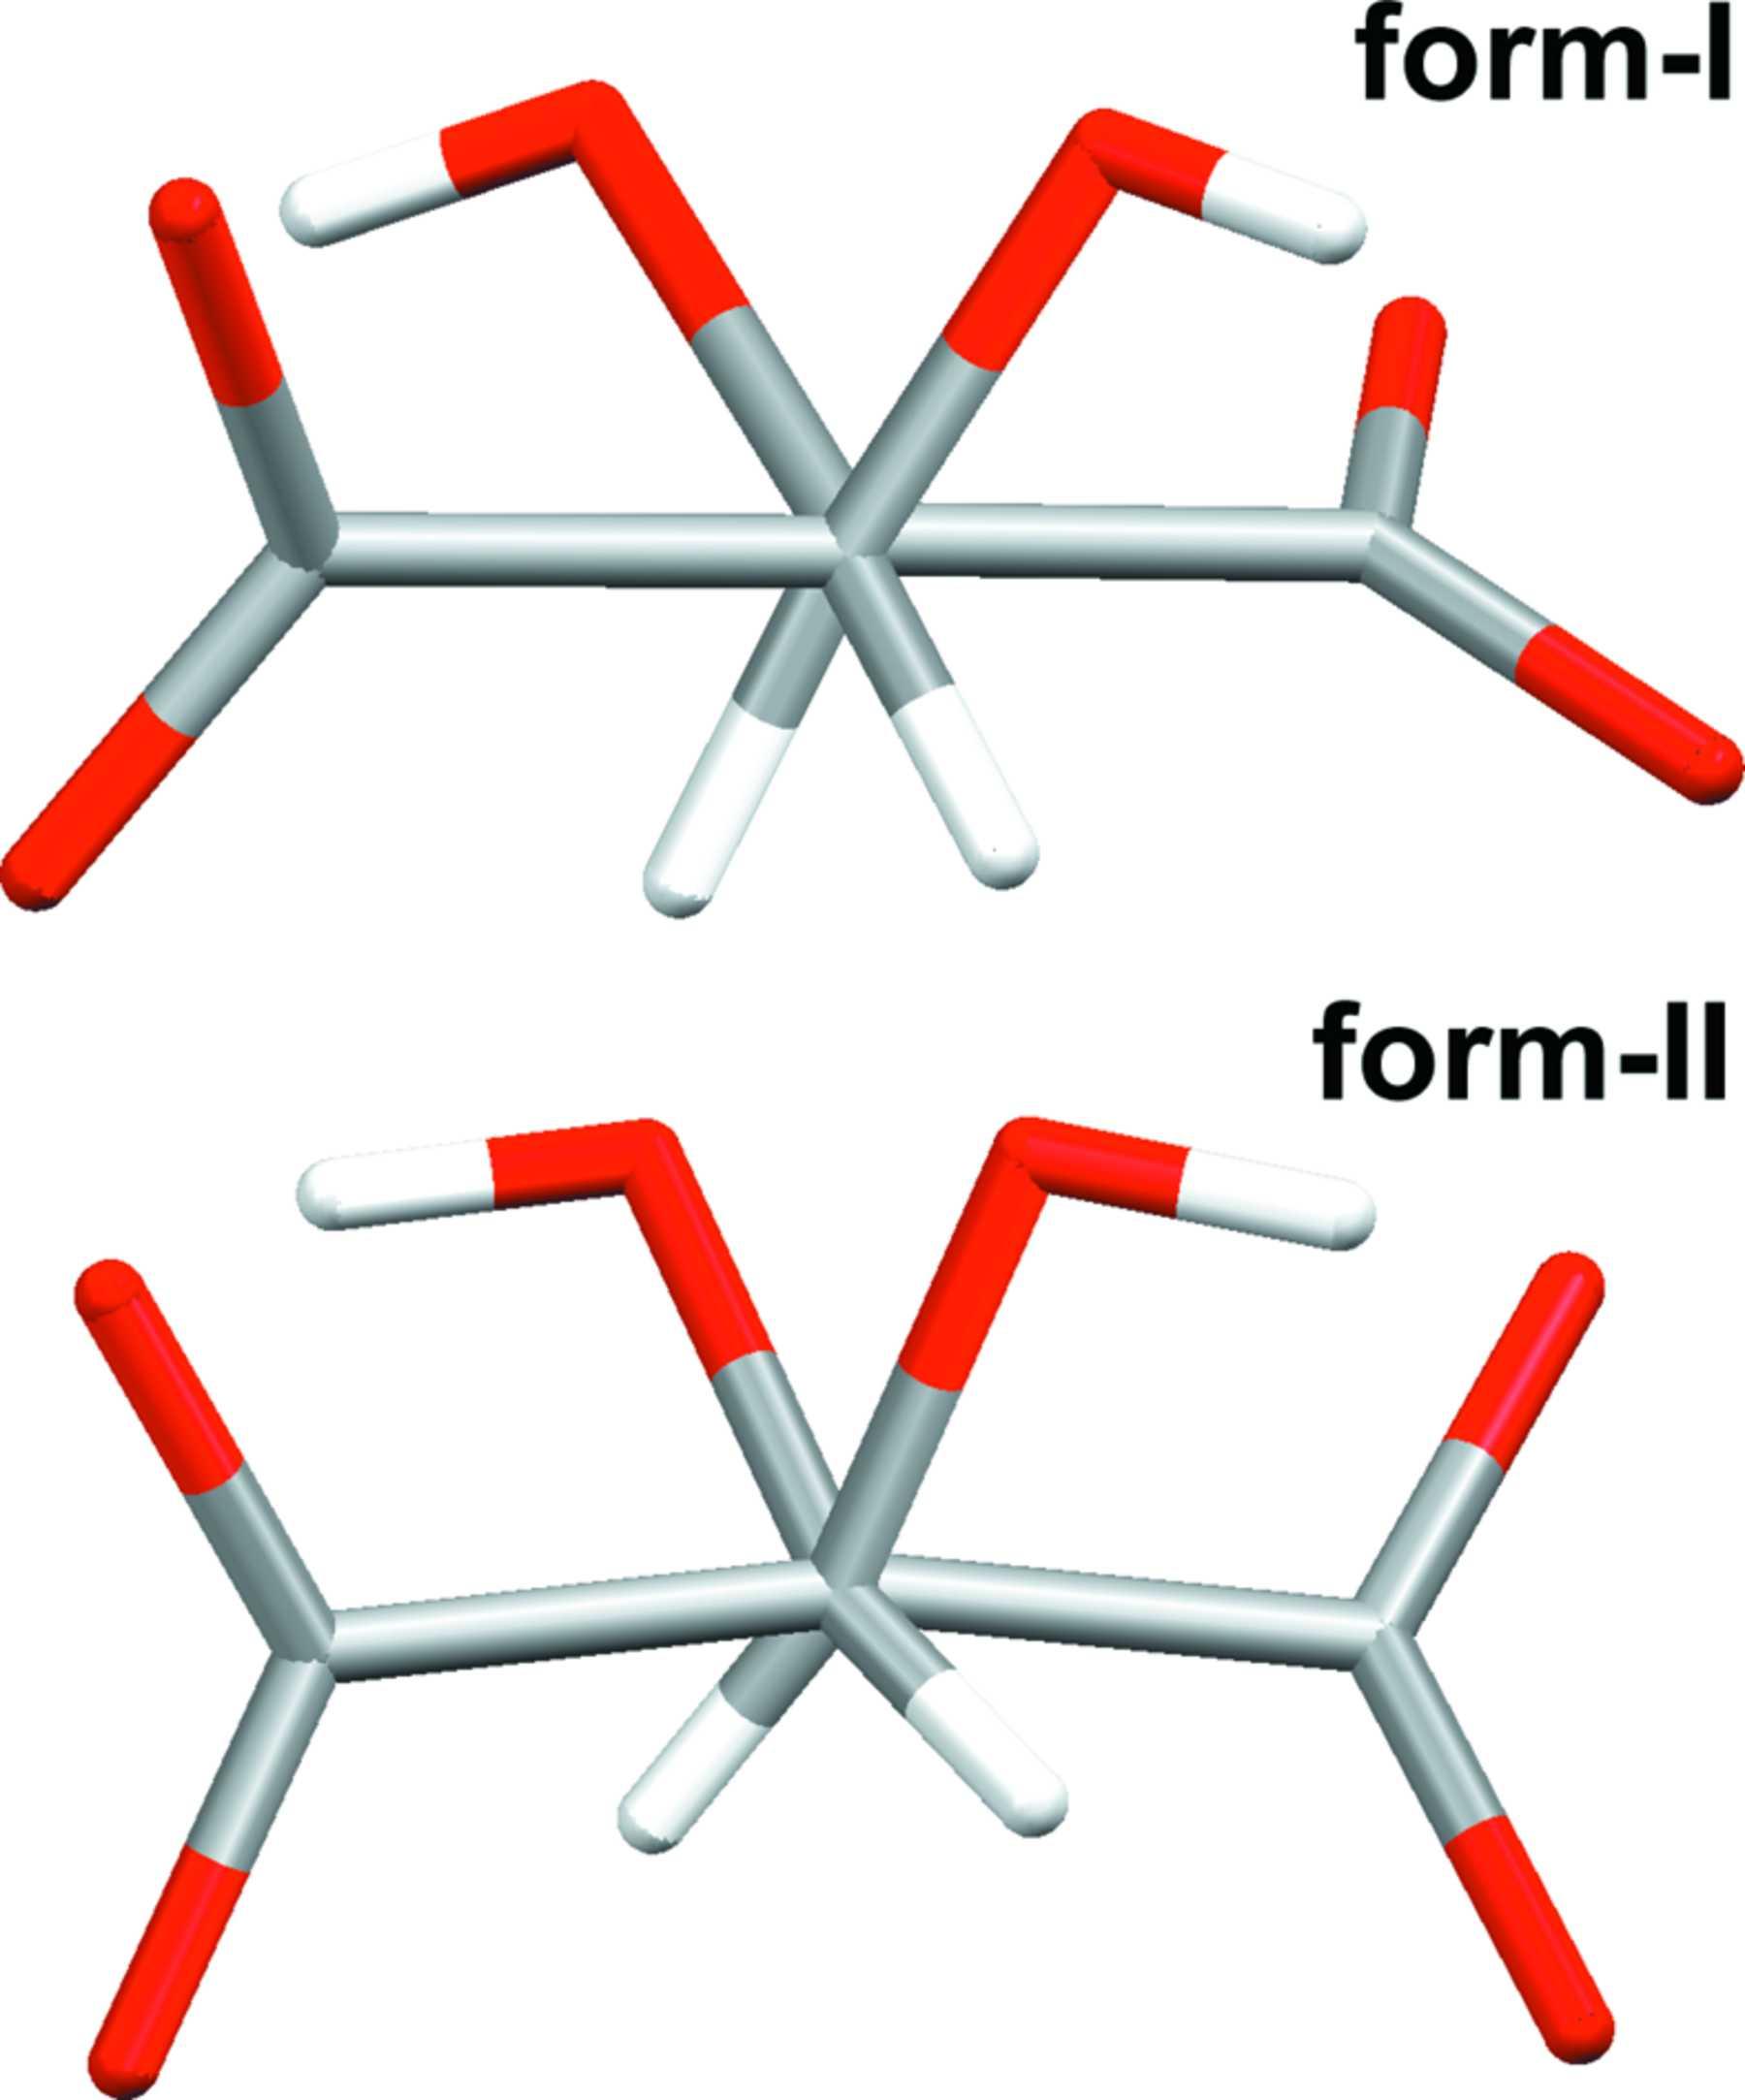 IUCr) Racemic calcium tartrate tetrahydrate [form (II)] in rat.